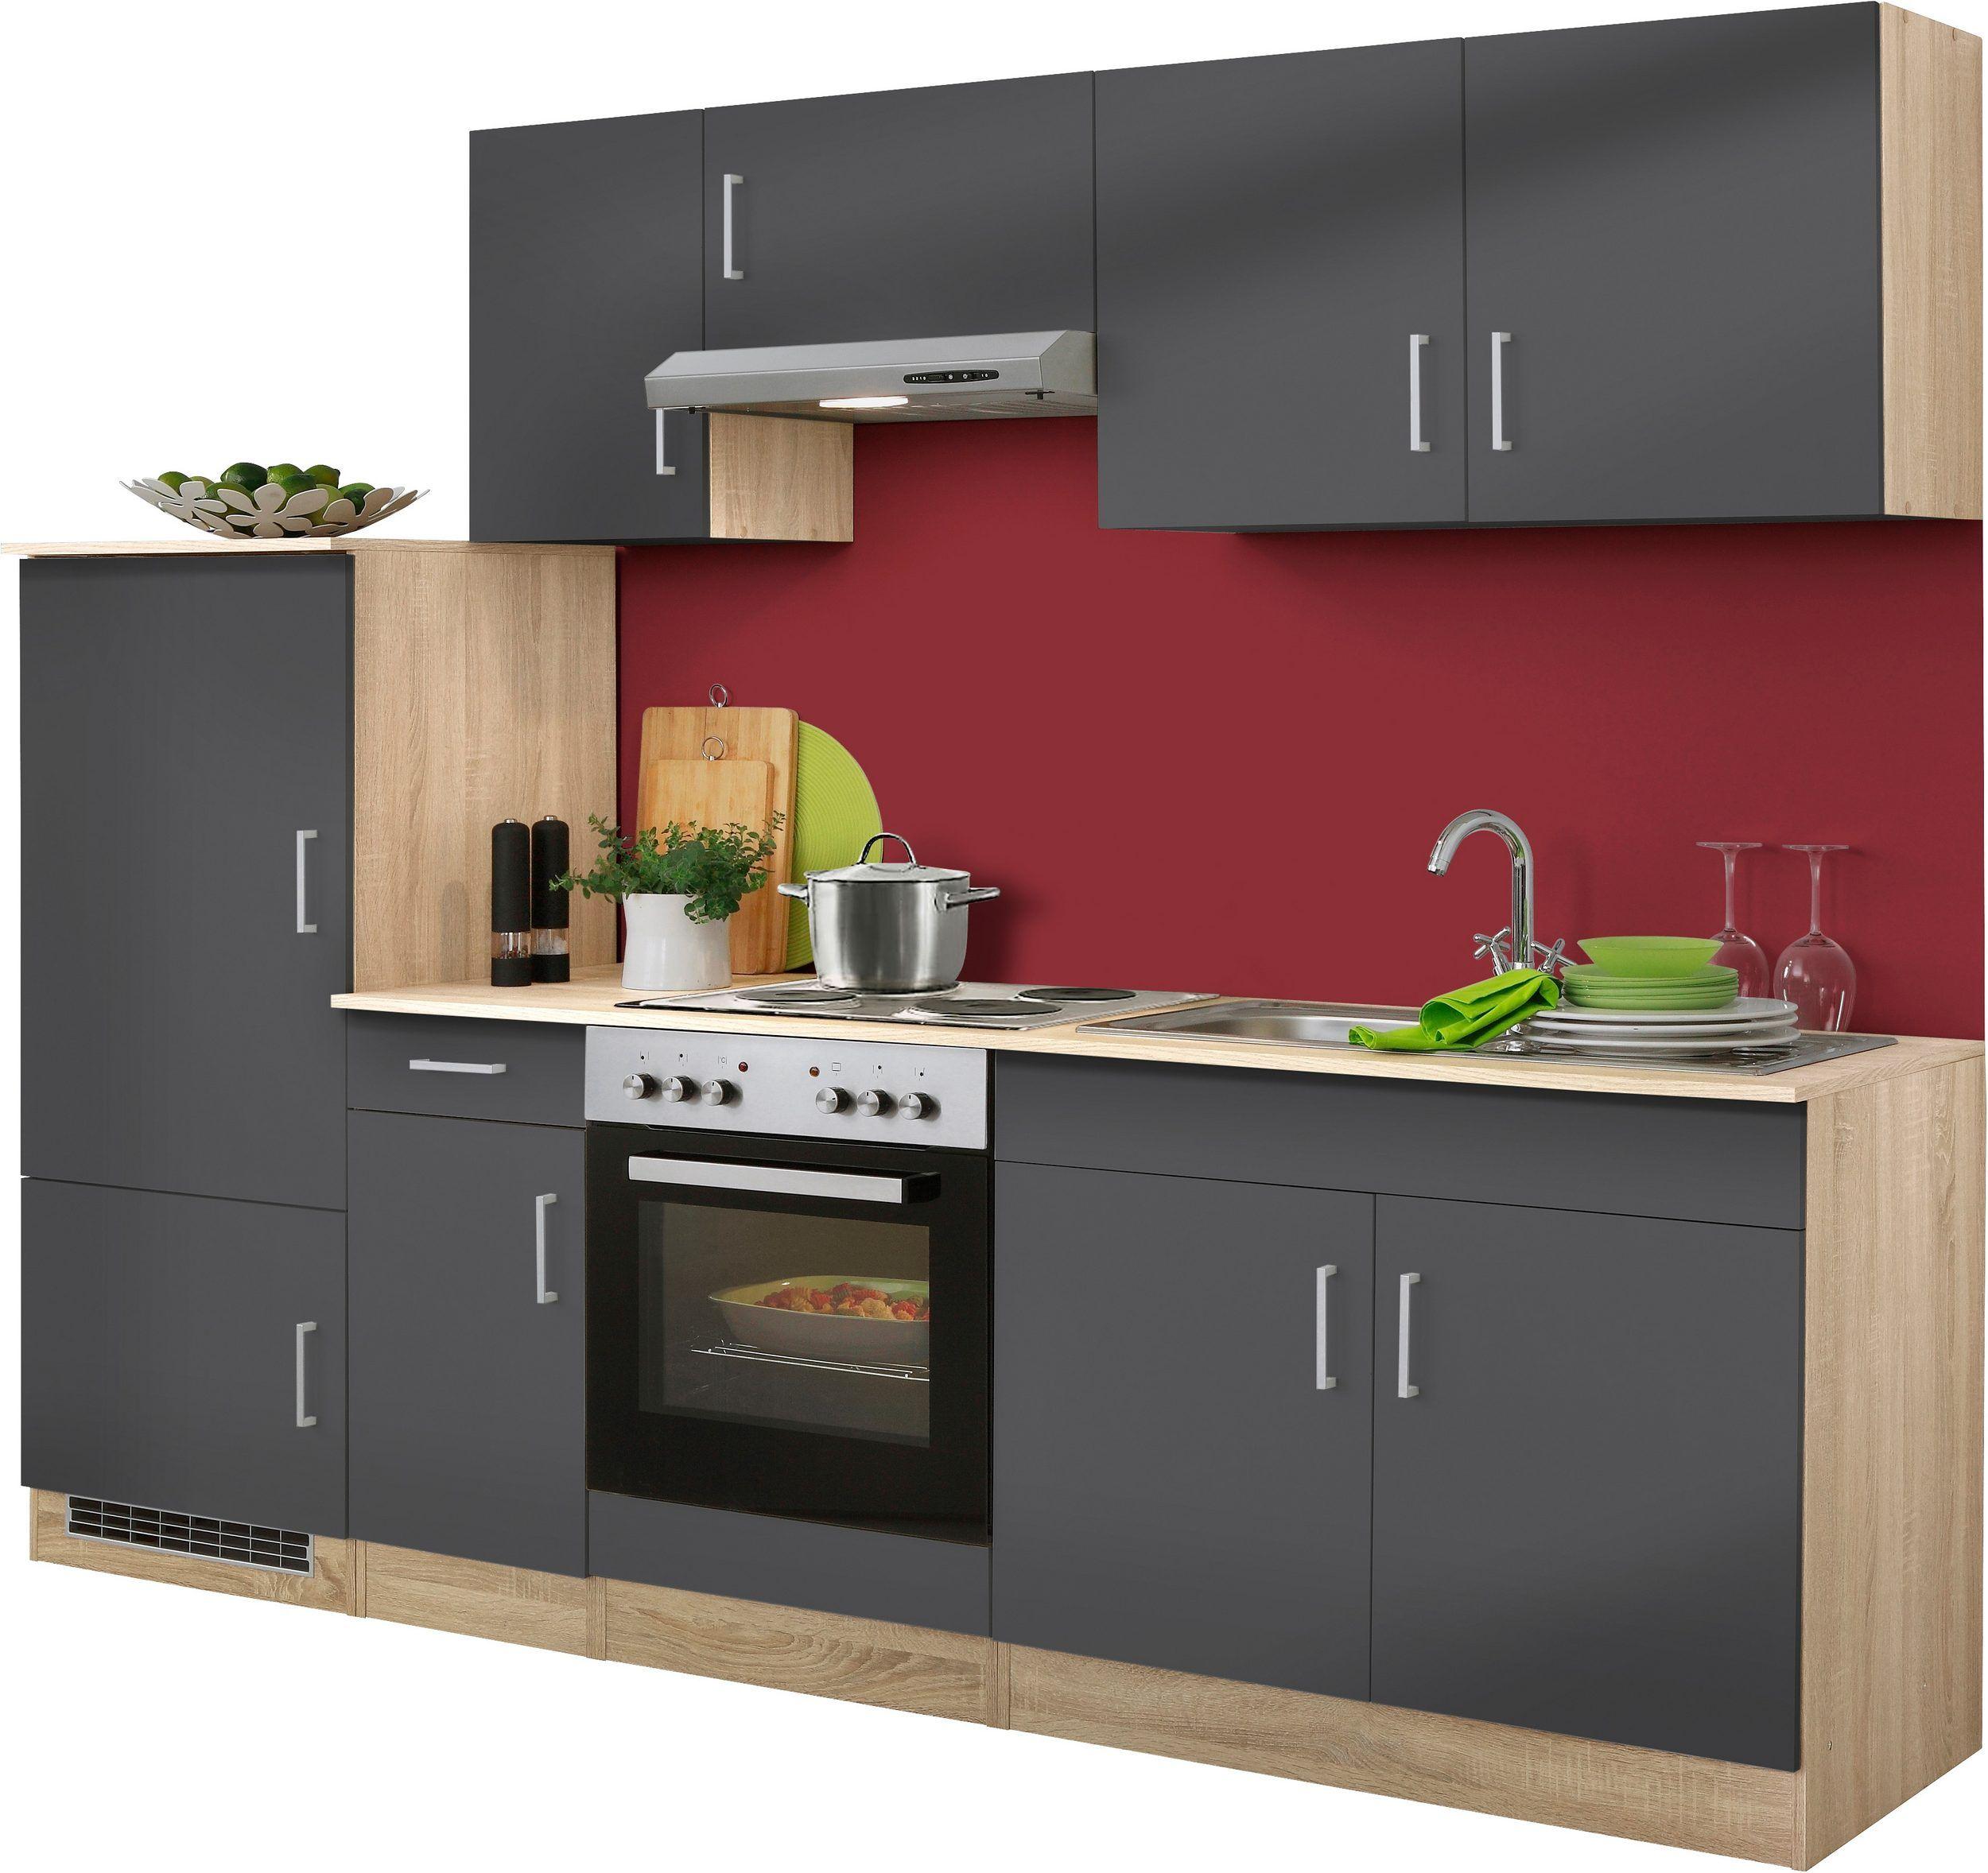 Held Mobel Held Kitchen Cabinets Kitchen Cabinets Kitchen Cabinet